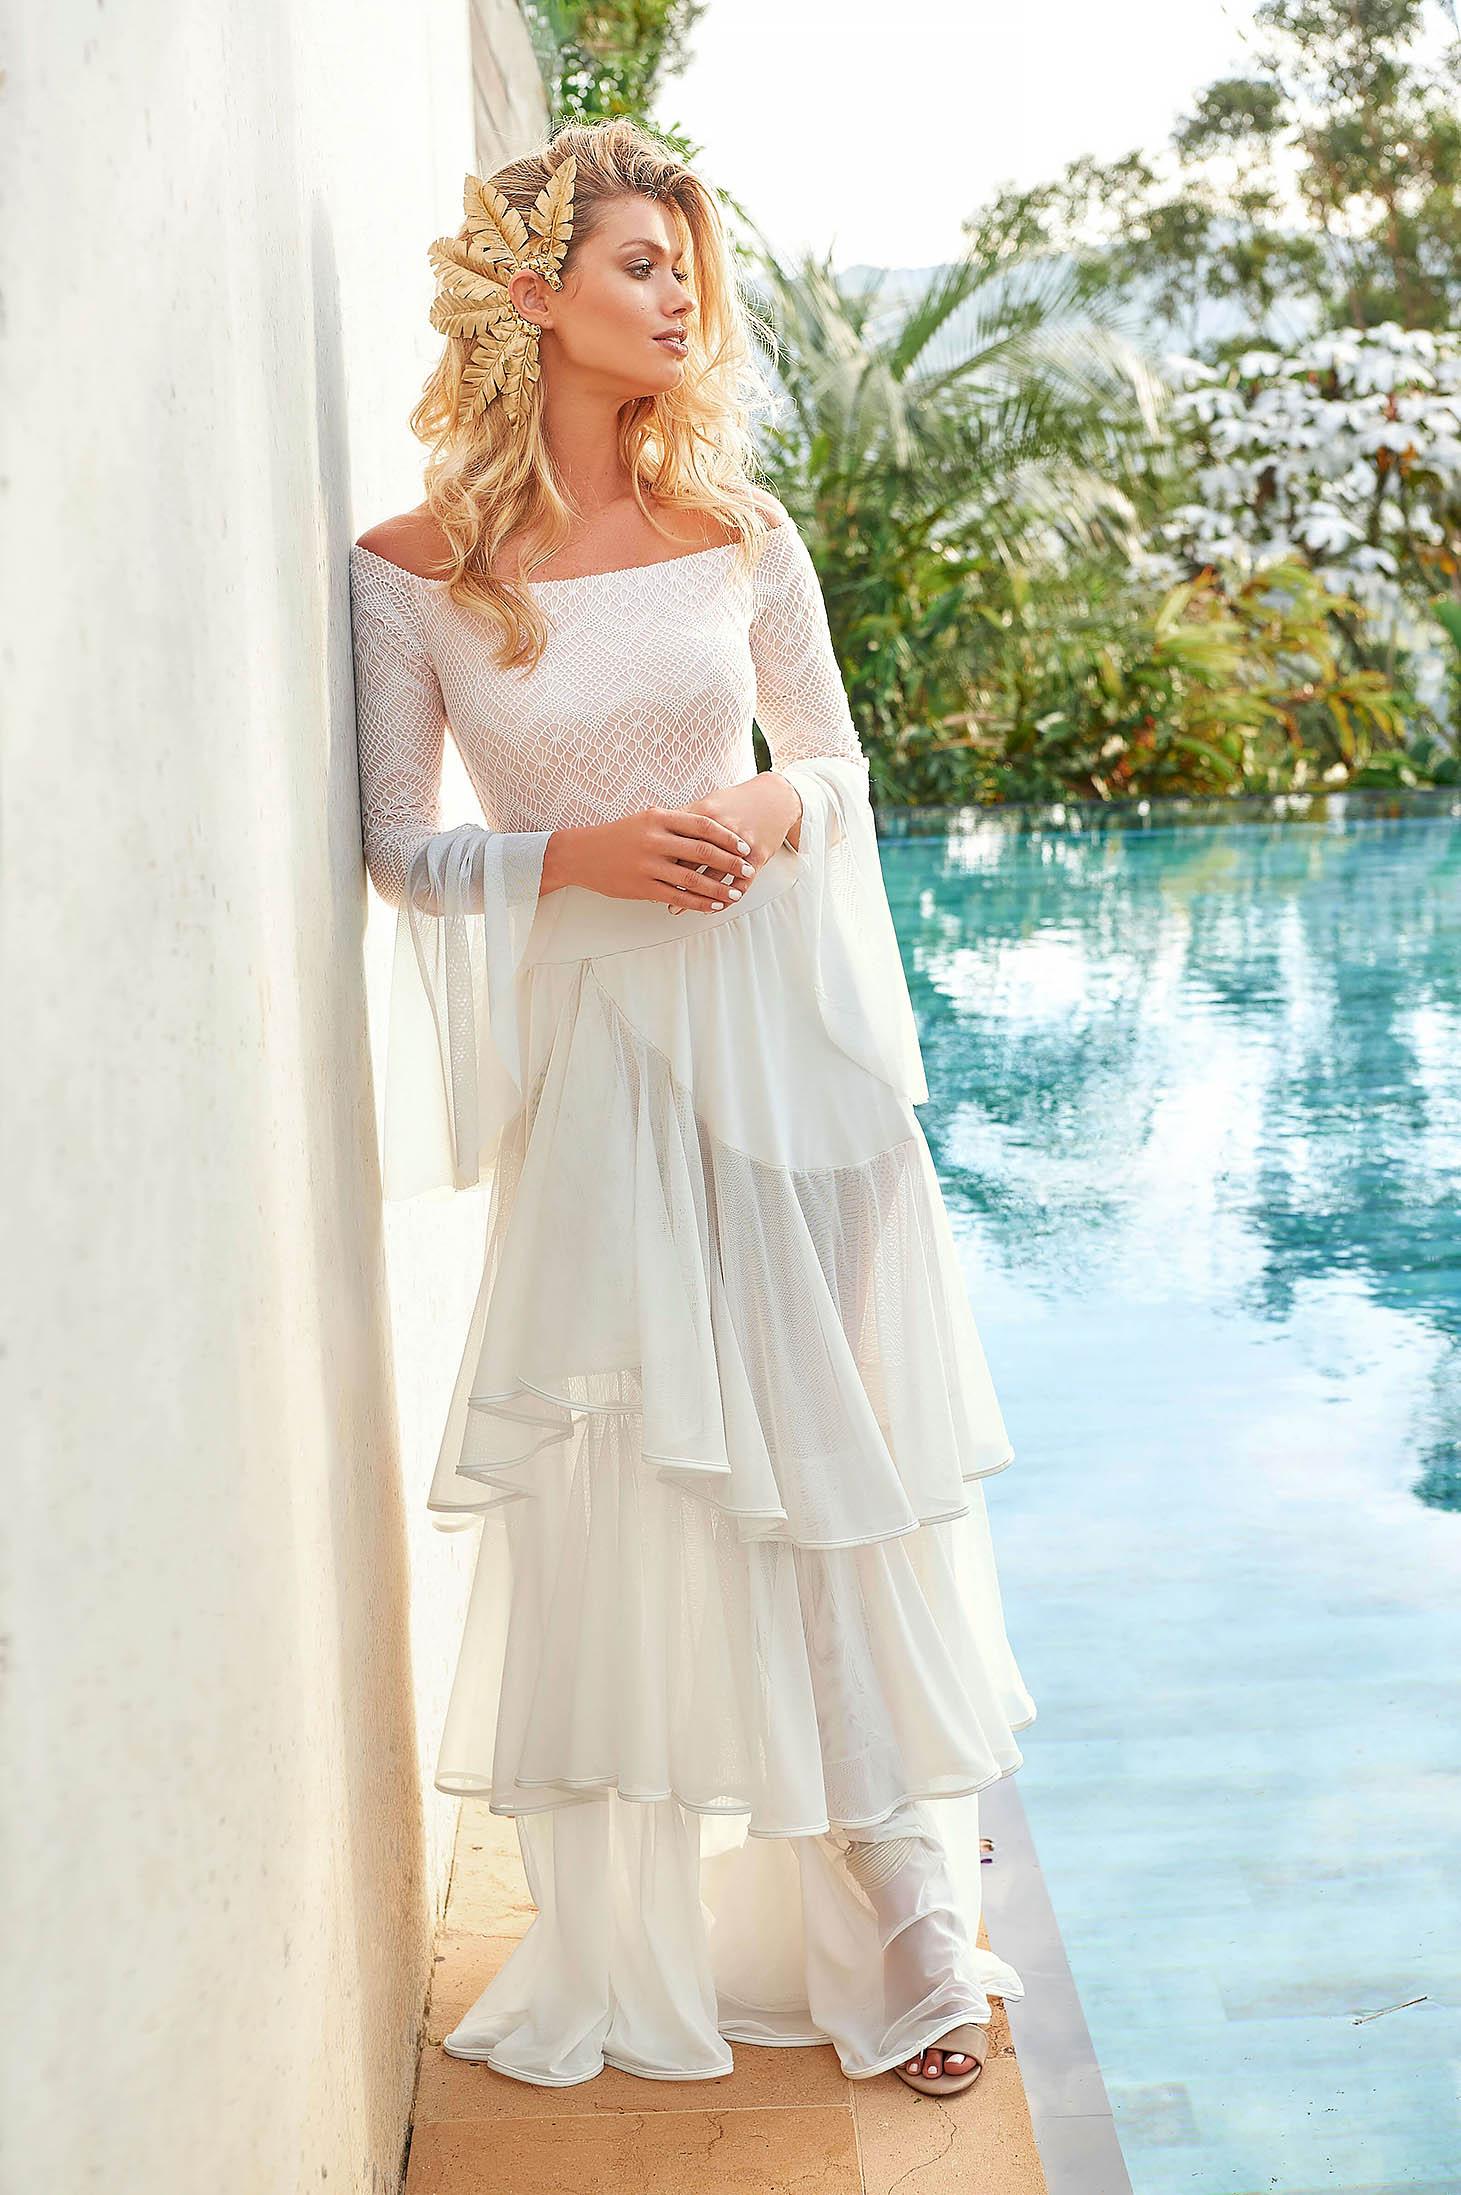 White skirt luxurious beach wear